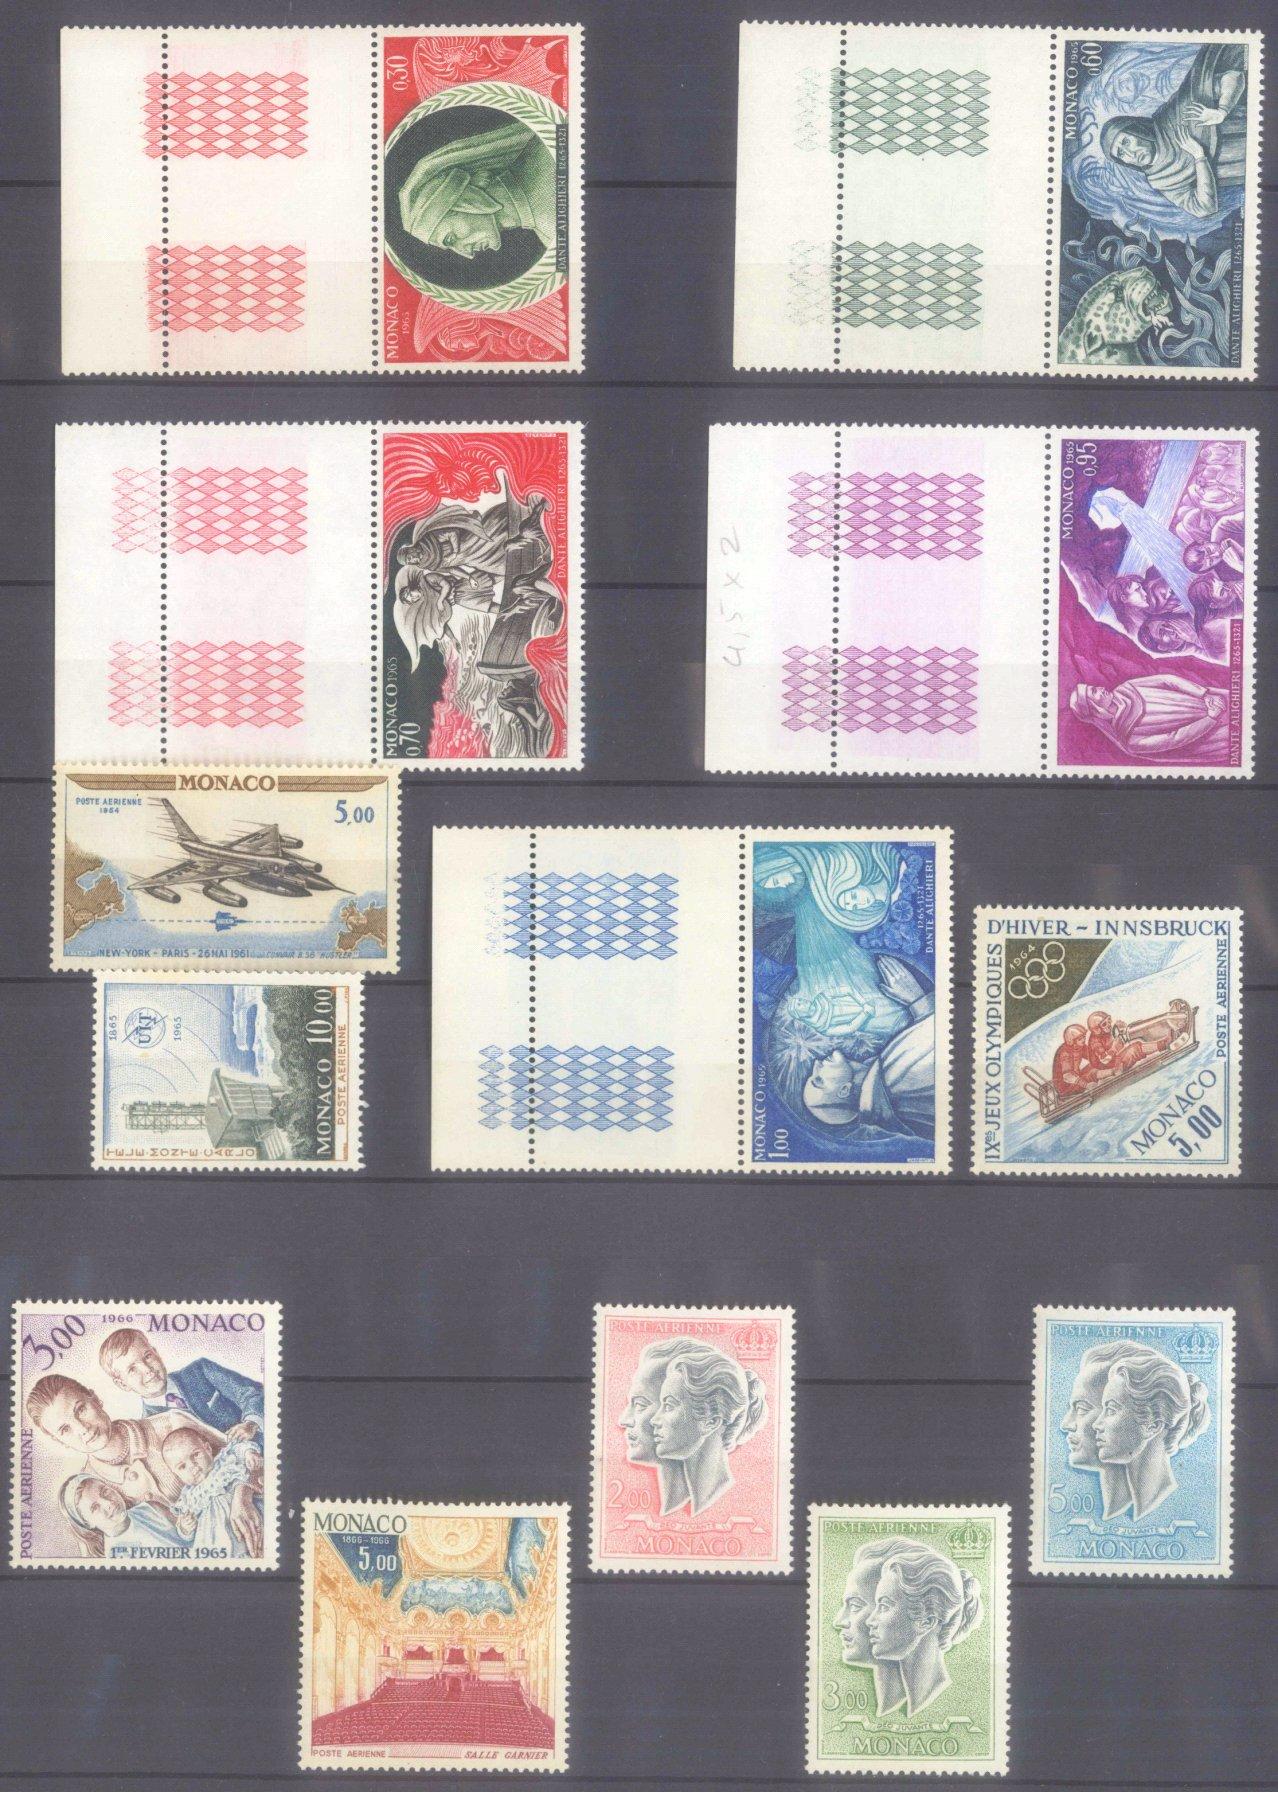 MONACO 1953-1989, Katalogwert 970,- Euro-7